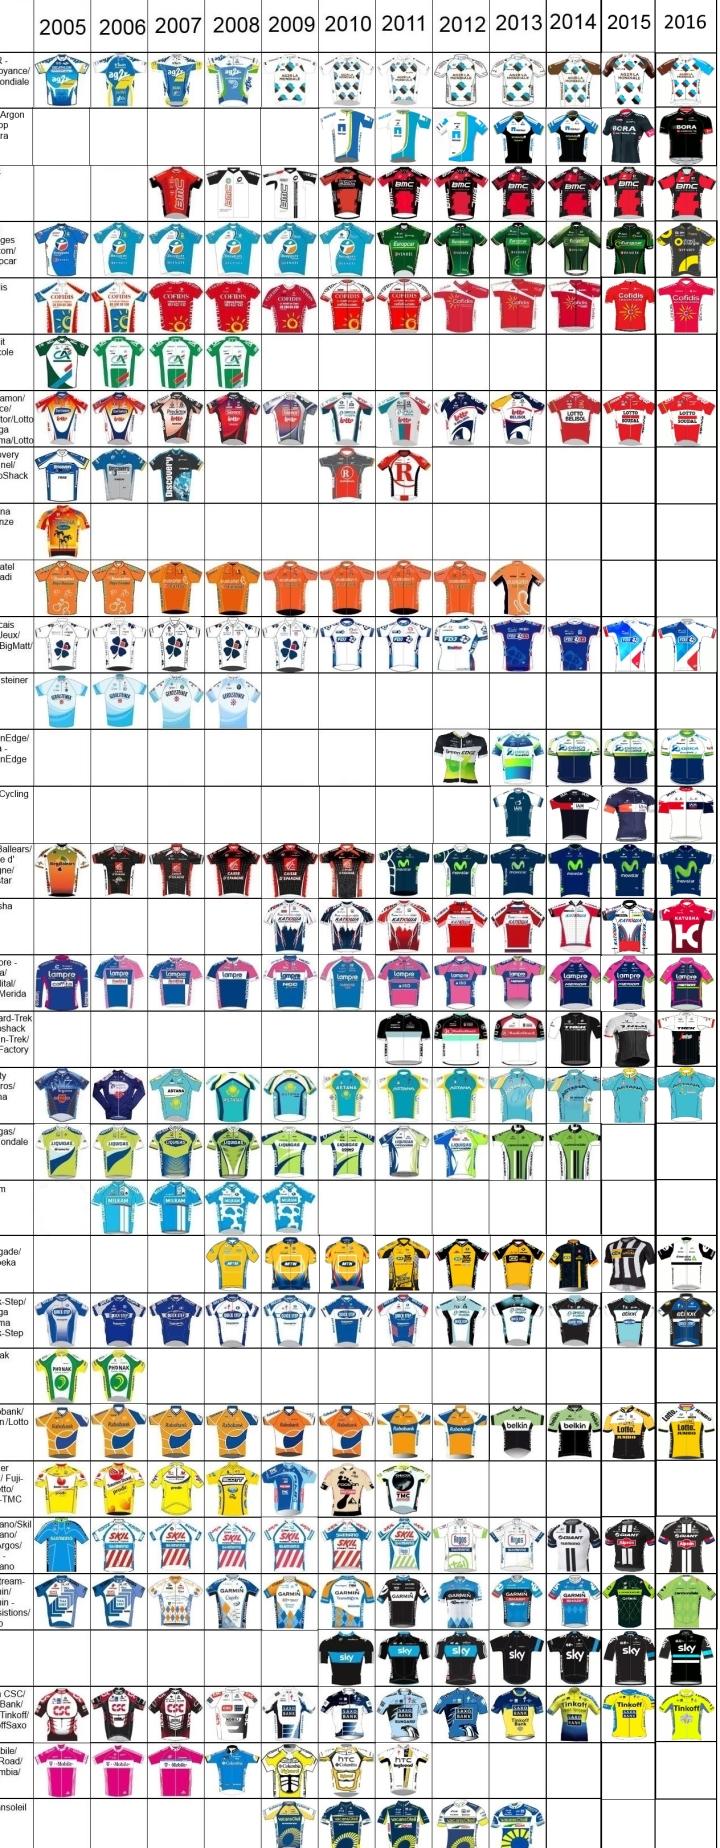 05-16shirts